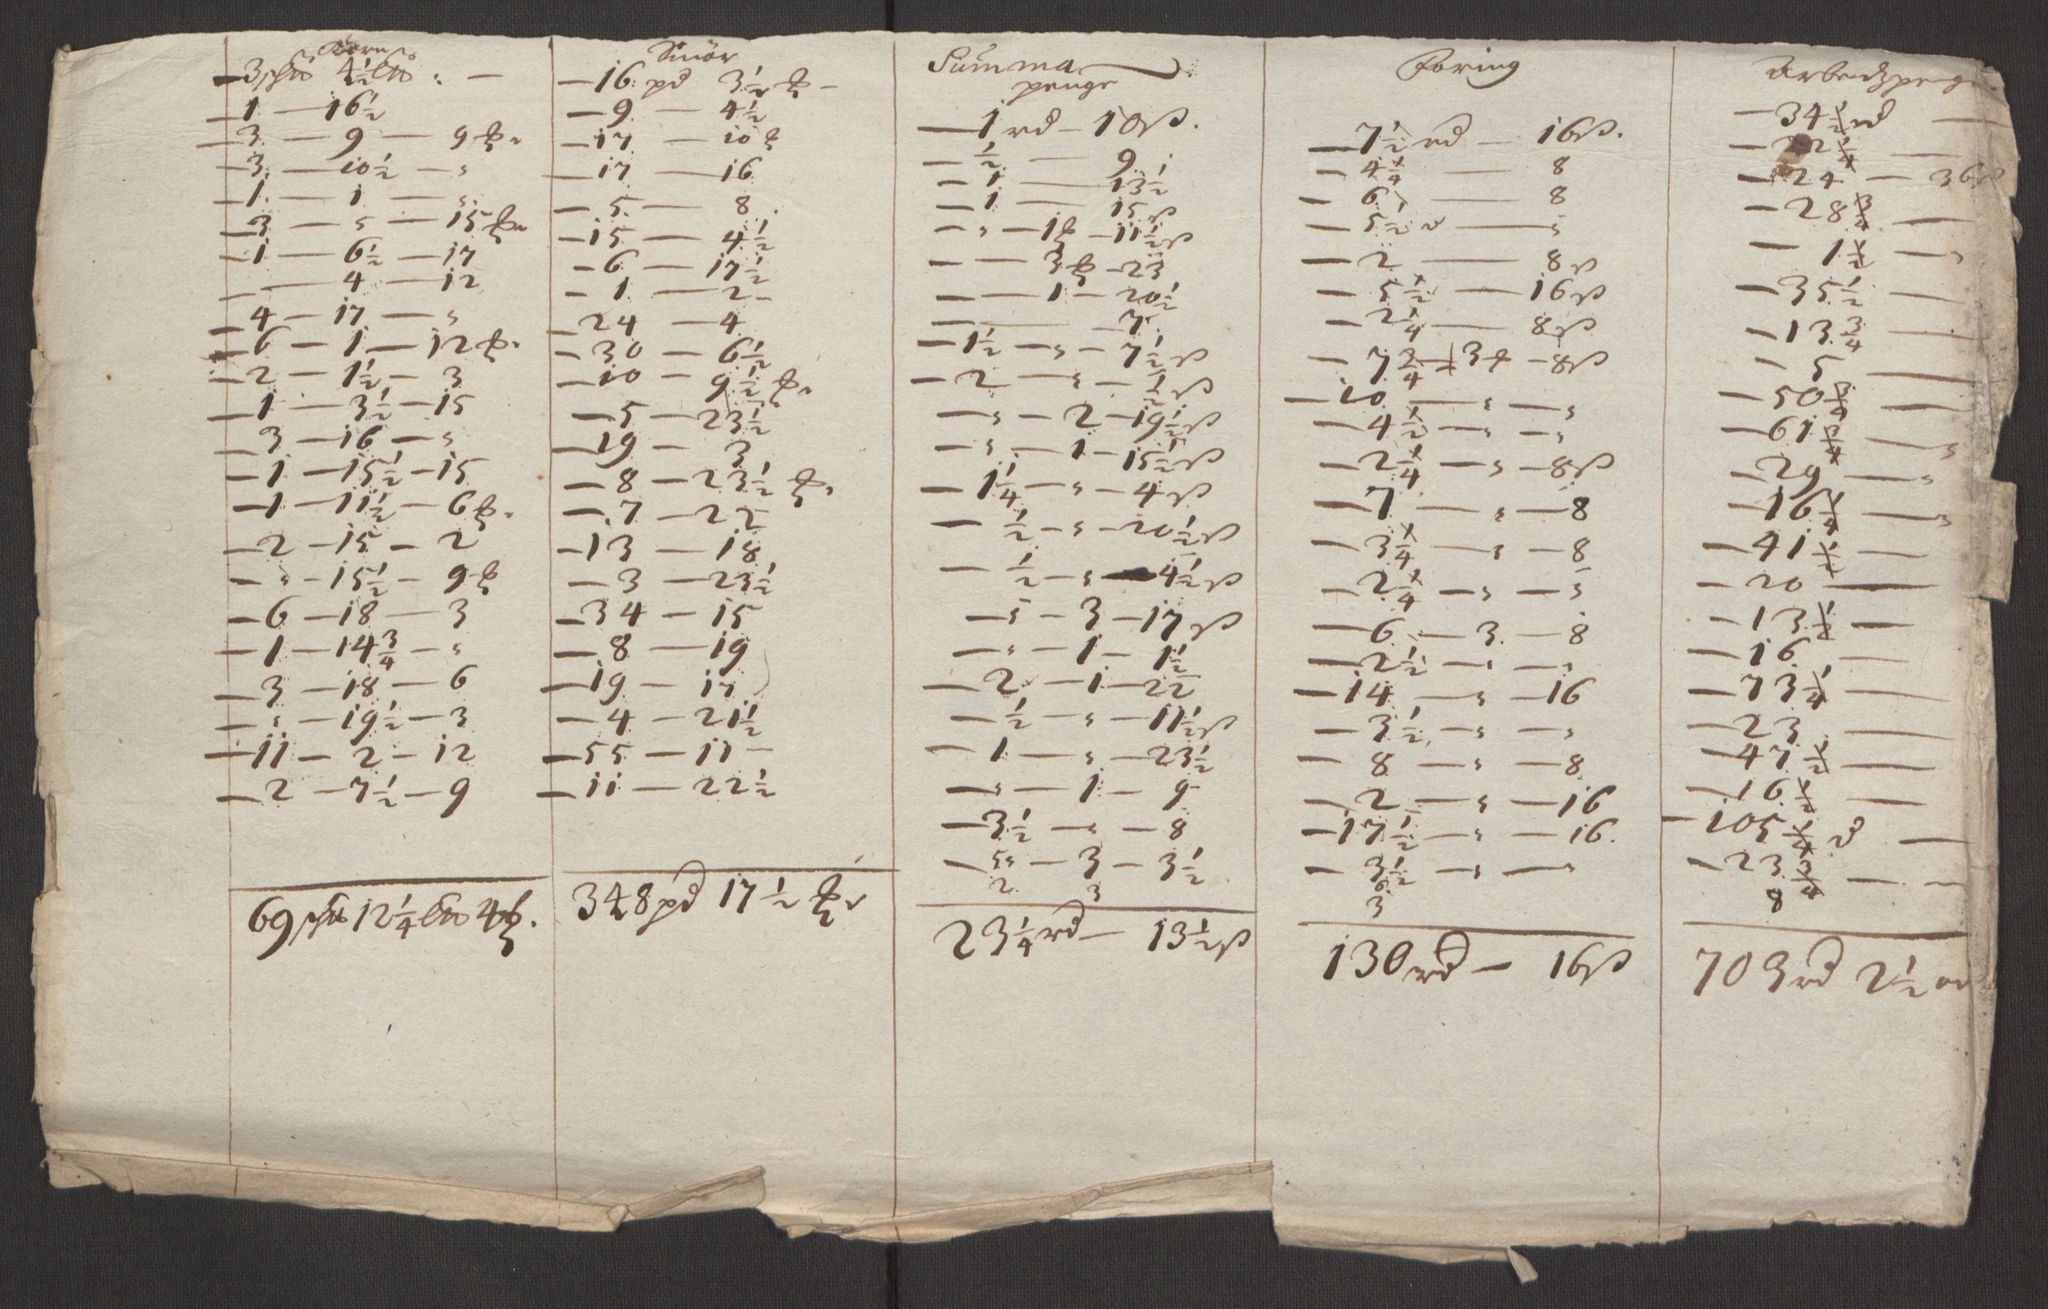 RA, Rentekammeret inntil 1814, Reviderte regnskaper, Fogderegnskap, R32/L1843: Fogderegnskap Jarlsberg grevskap, 1674-1675, s. 110